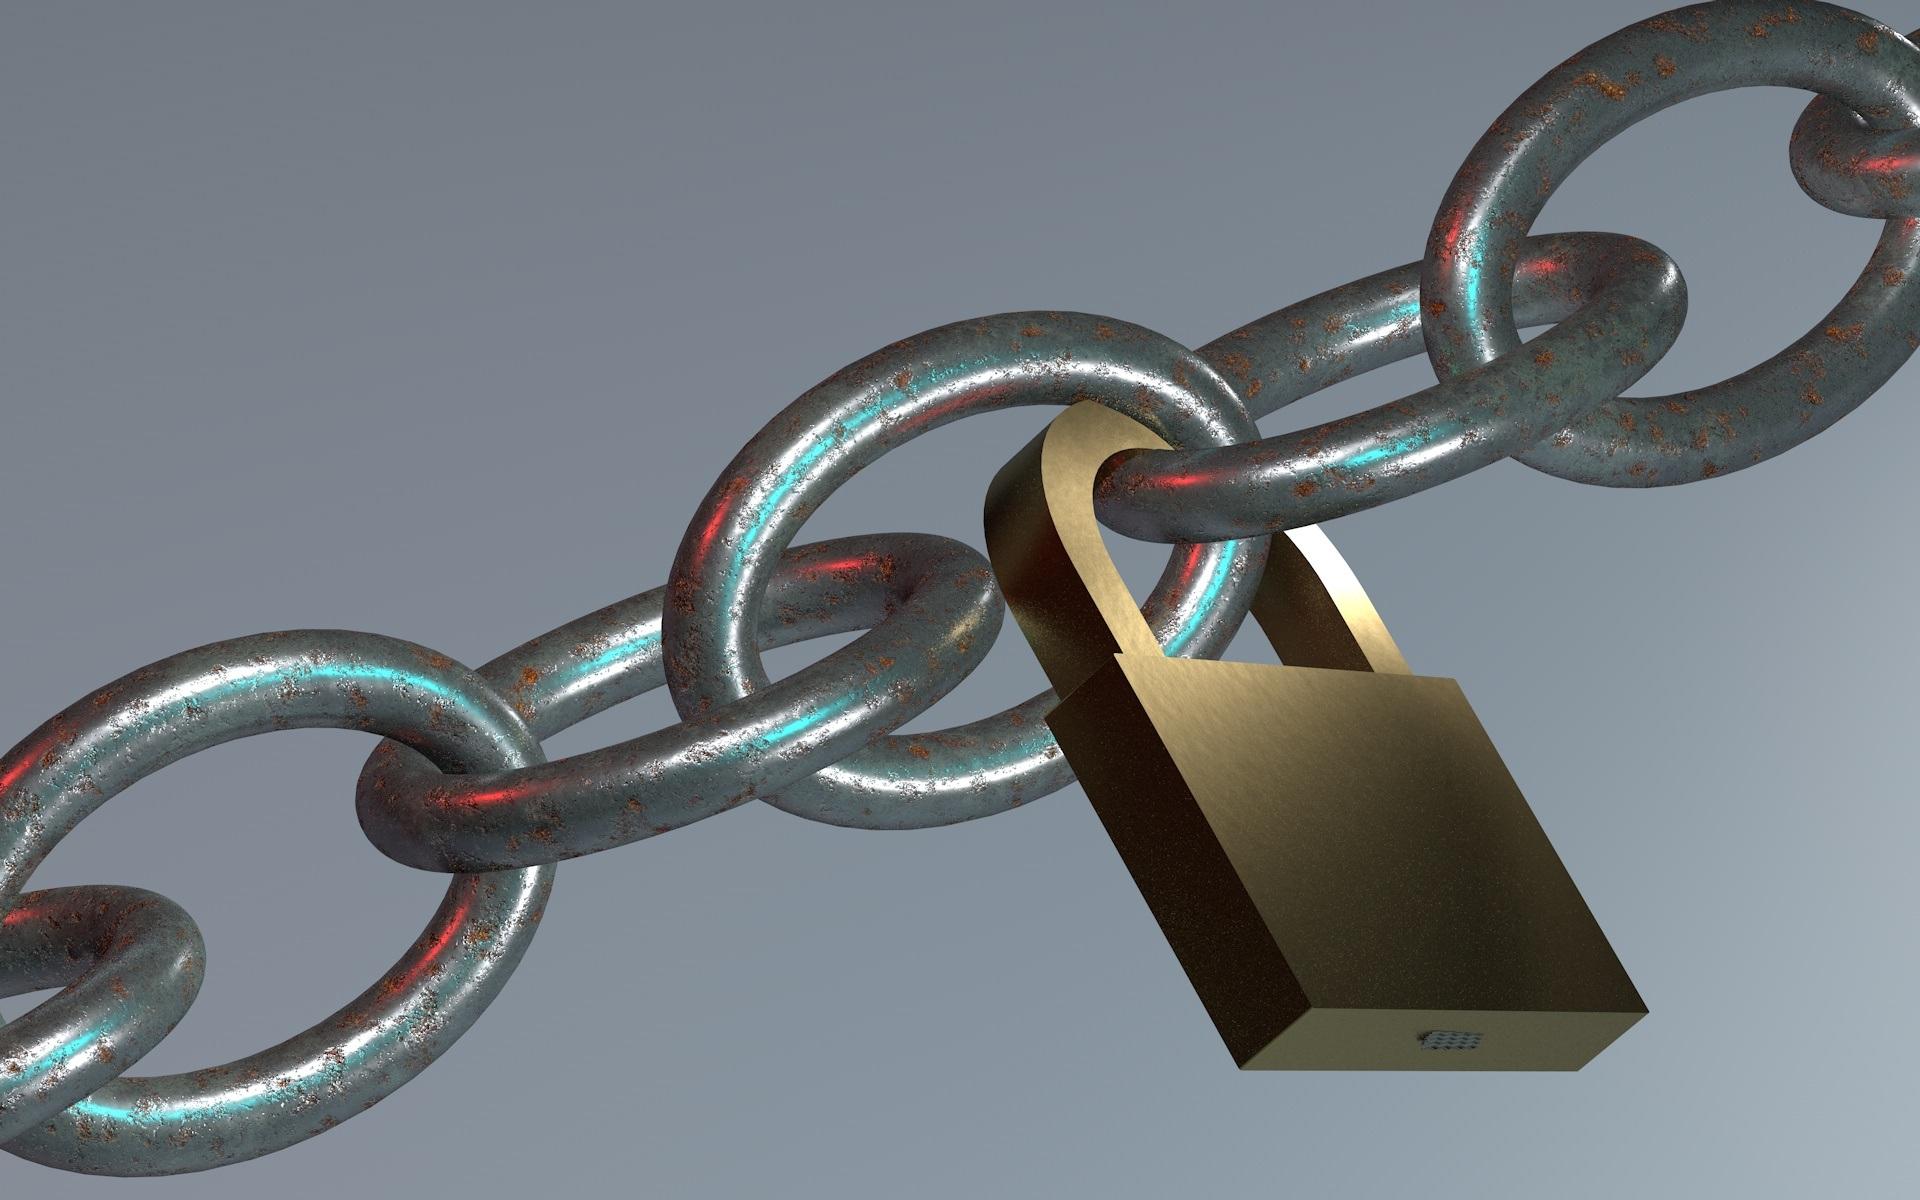 Chain and Lock, Chain, Closed, Graduated, Lock, HQ Photo